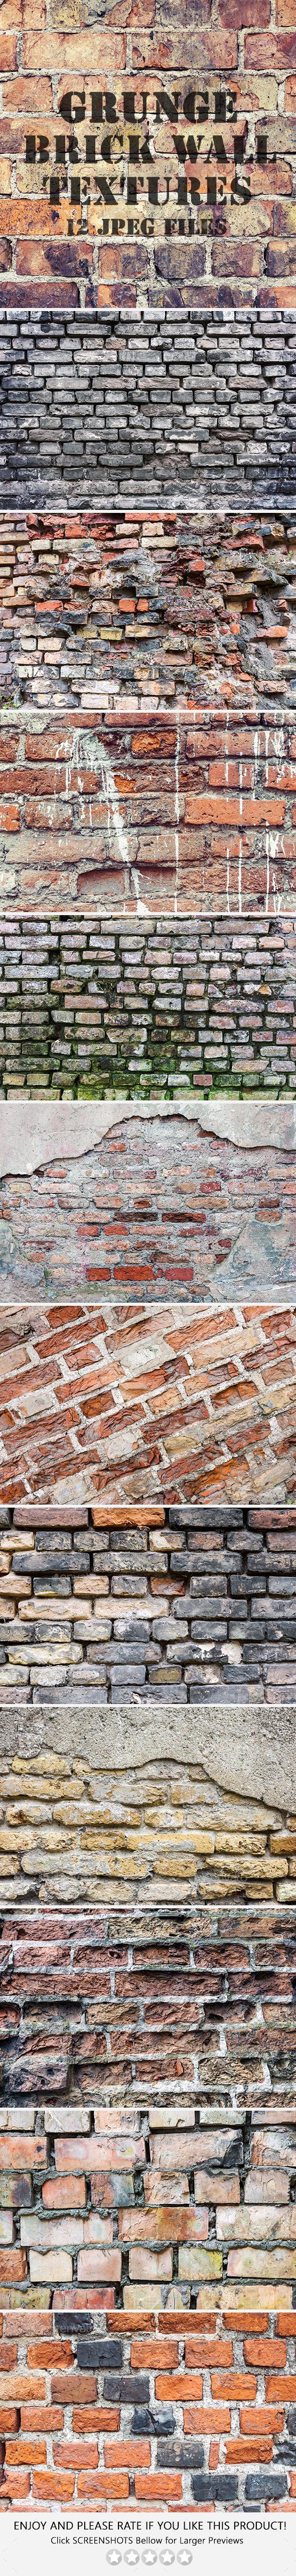 Old Brick Wall Textures - Industrial / Grunge Textures